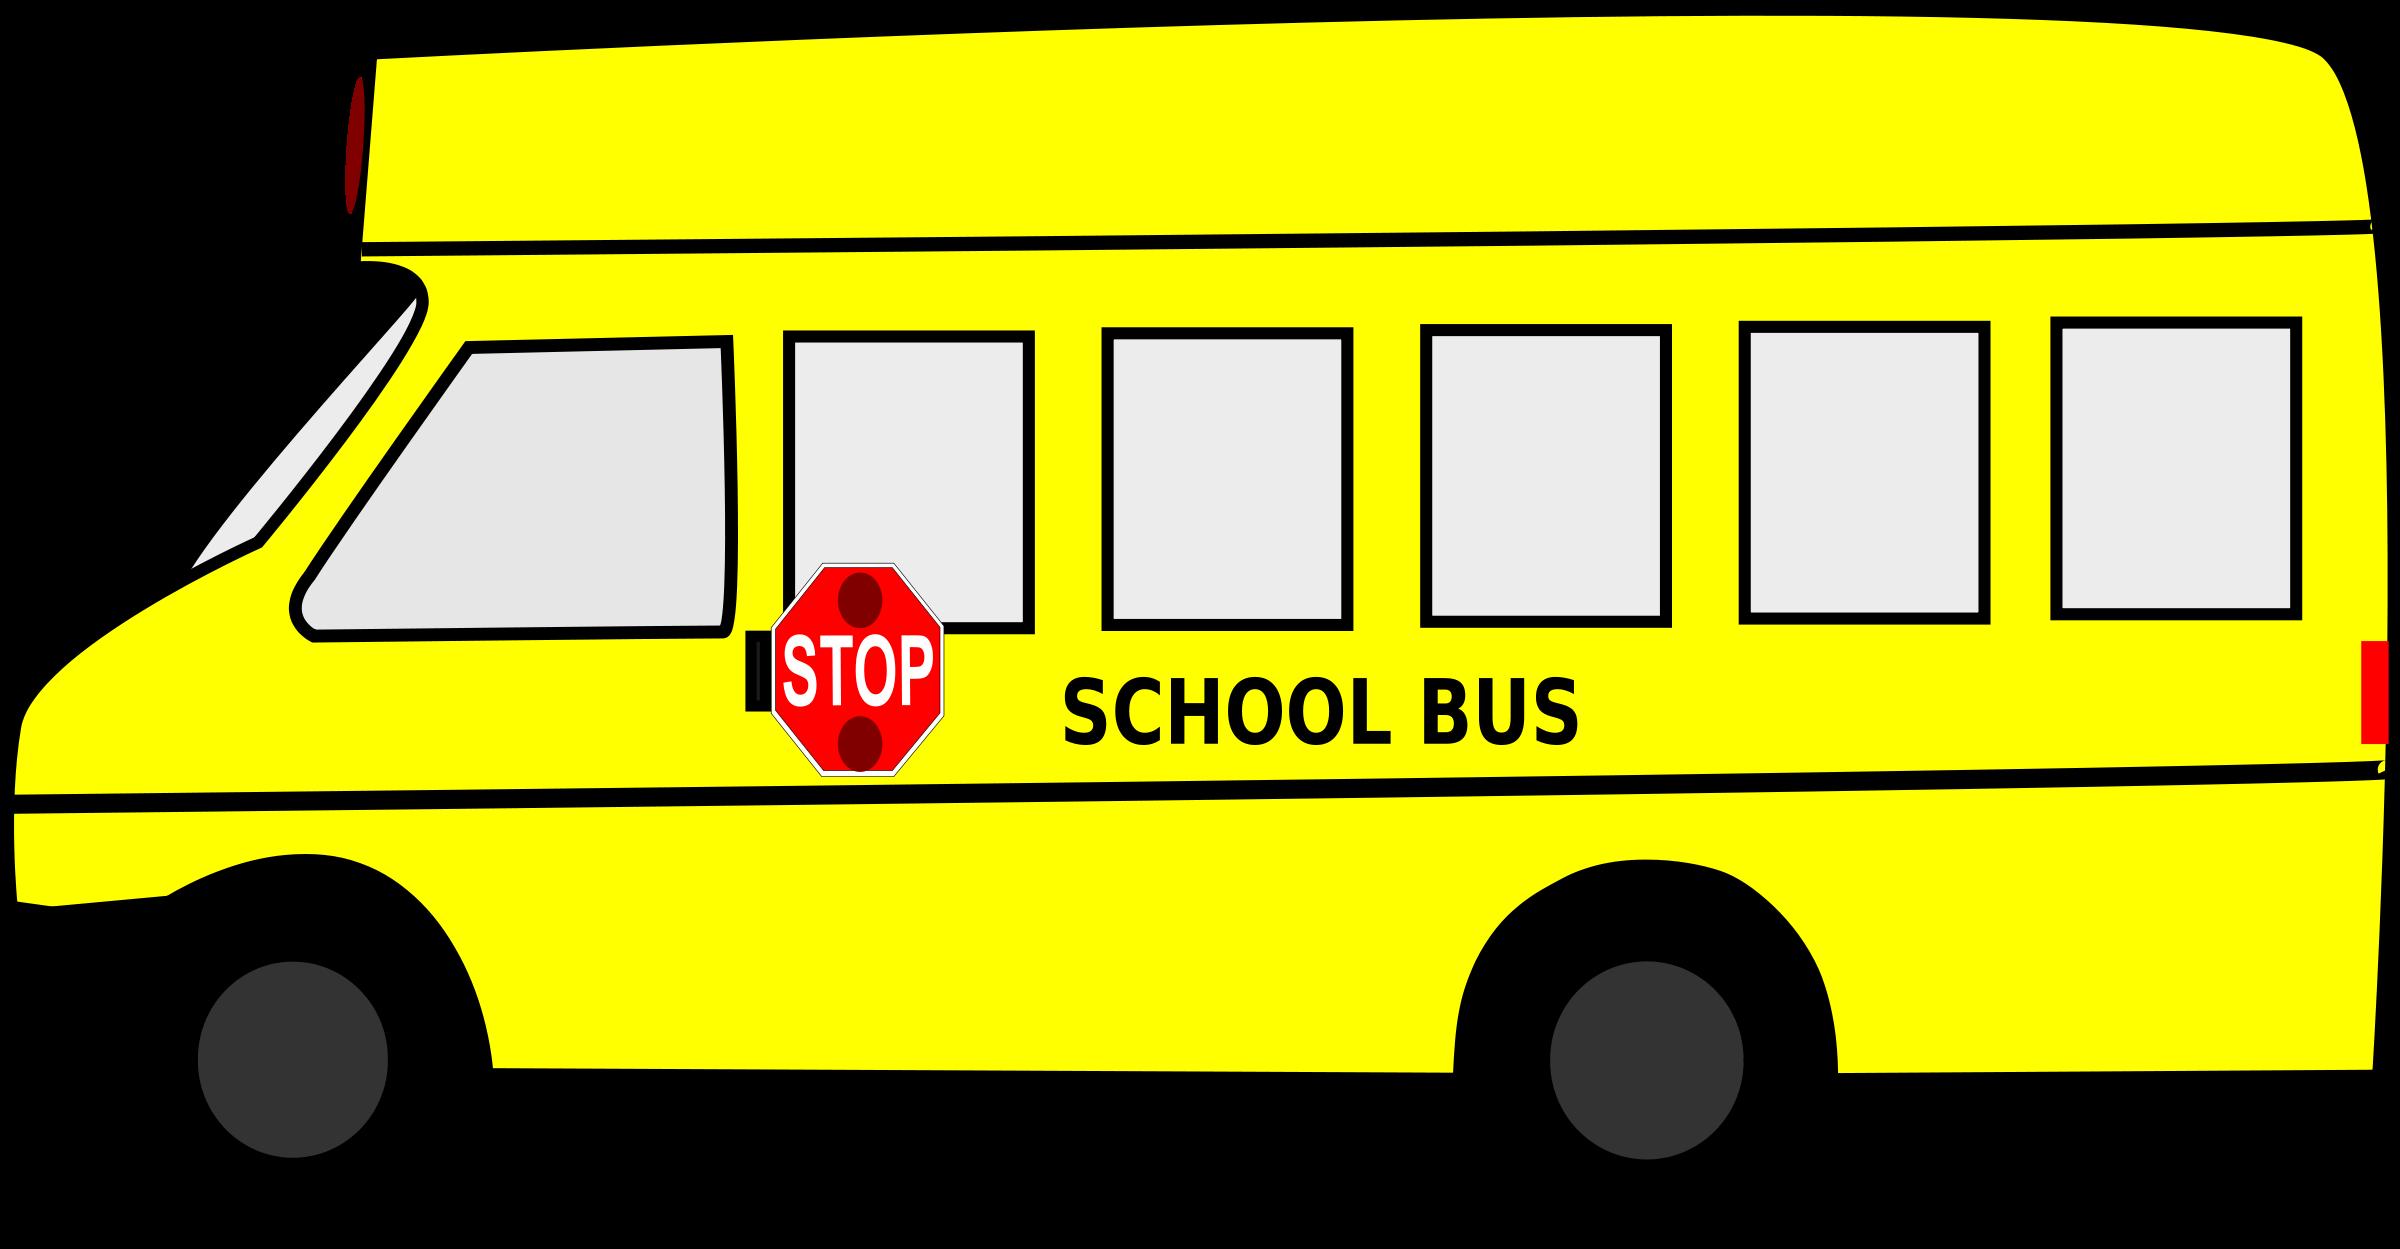 Clip Art School Bus - Viewing | Clipart Panda - Free Clipart Images